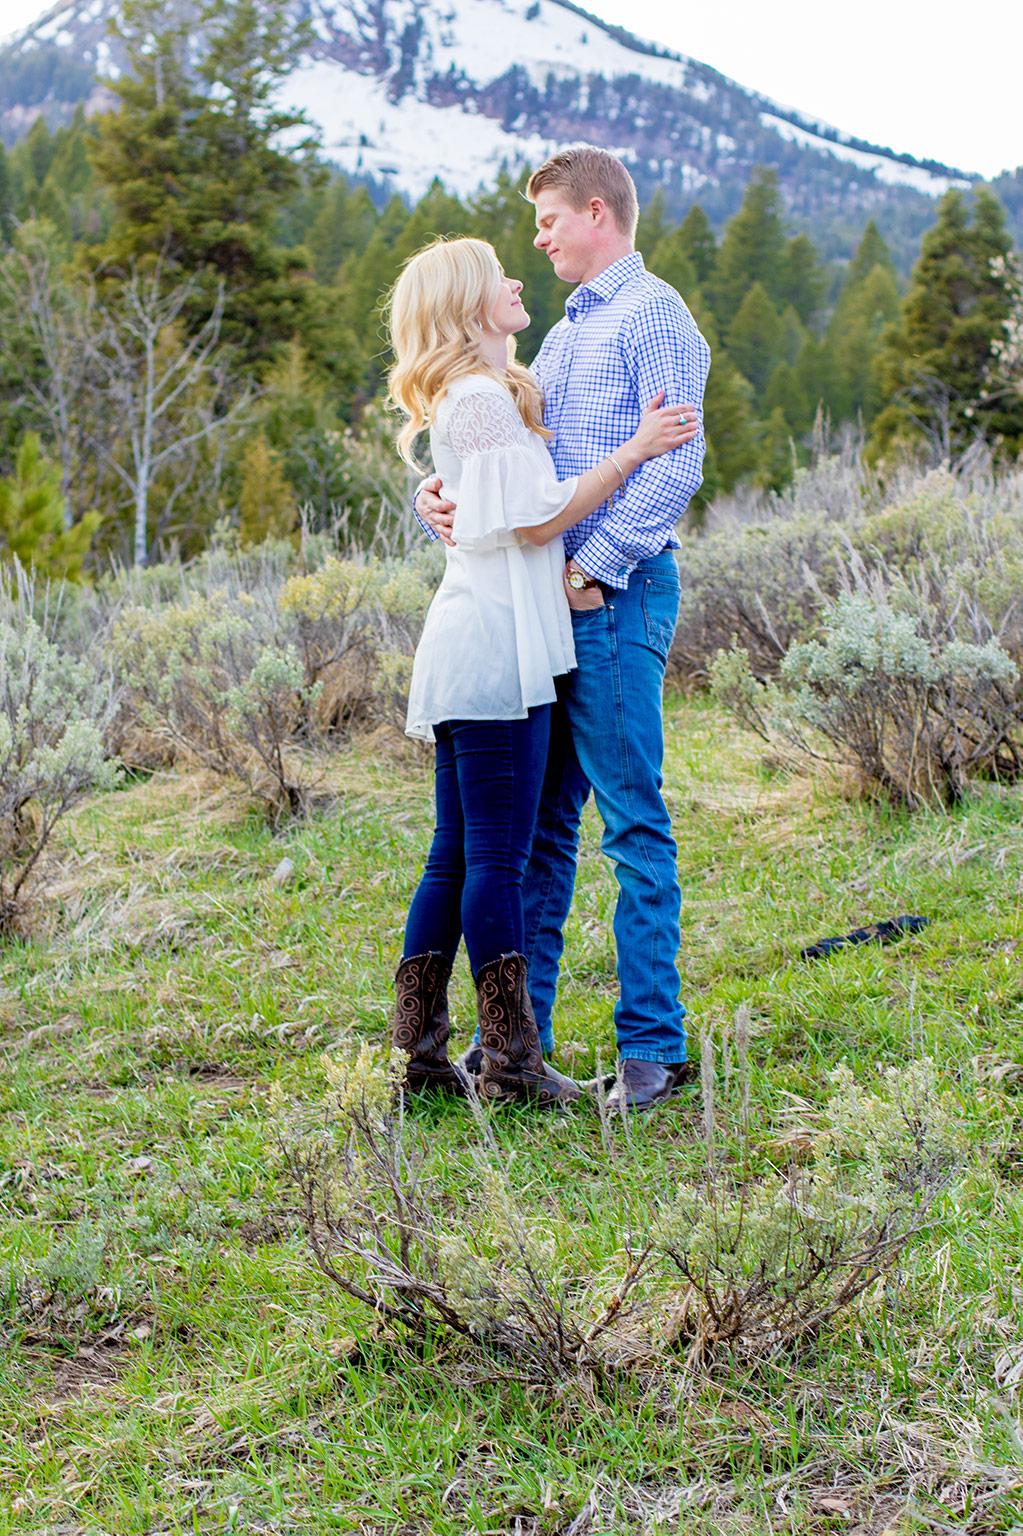 A pregnancy announcement photo shoot at Tibble Fork Reservoir, American Fork Canyon, UT | Arizona Photographer | Maren Elizabeth Photographer